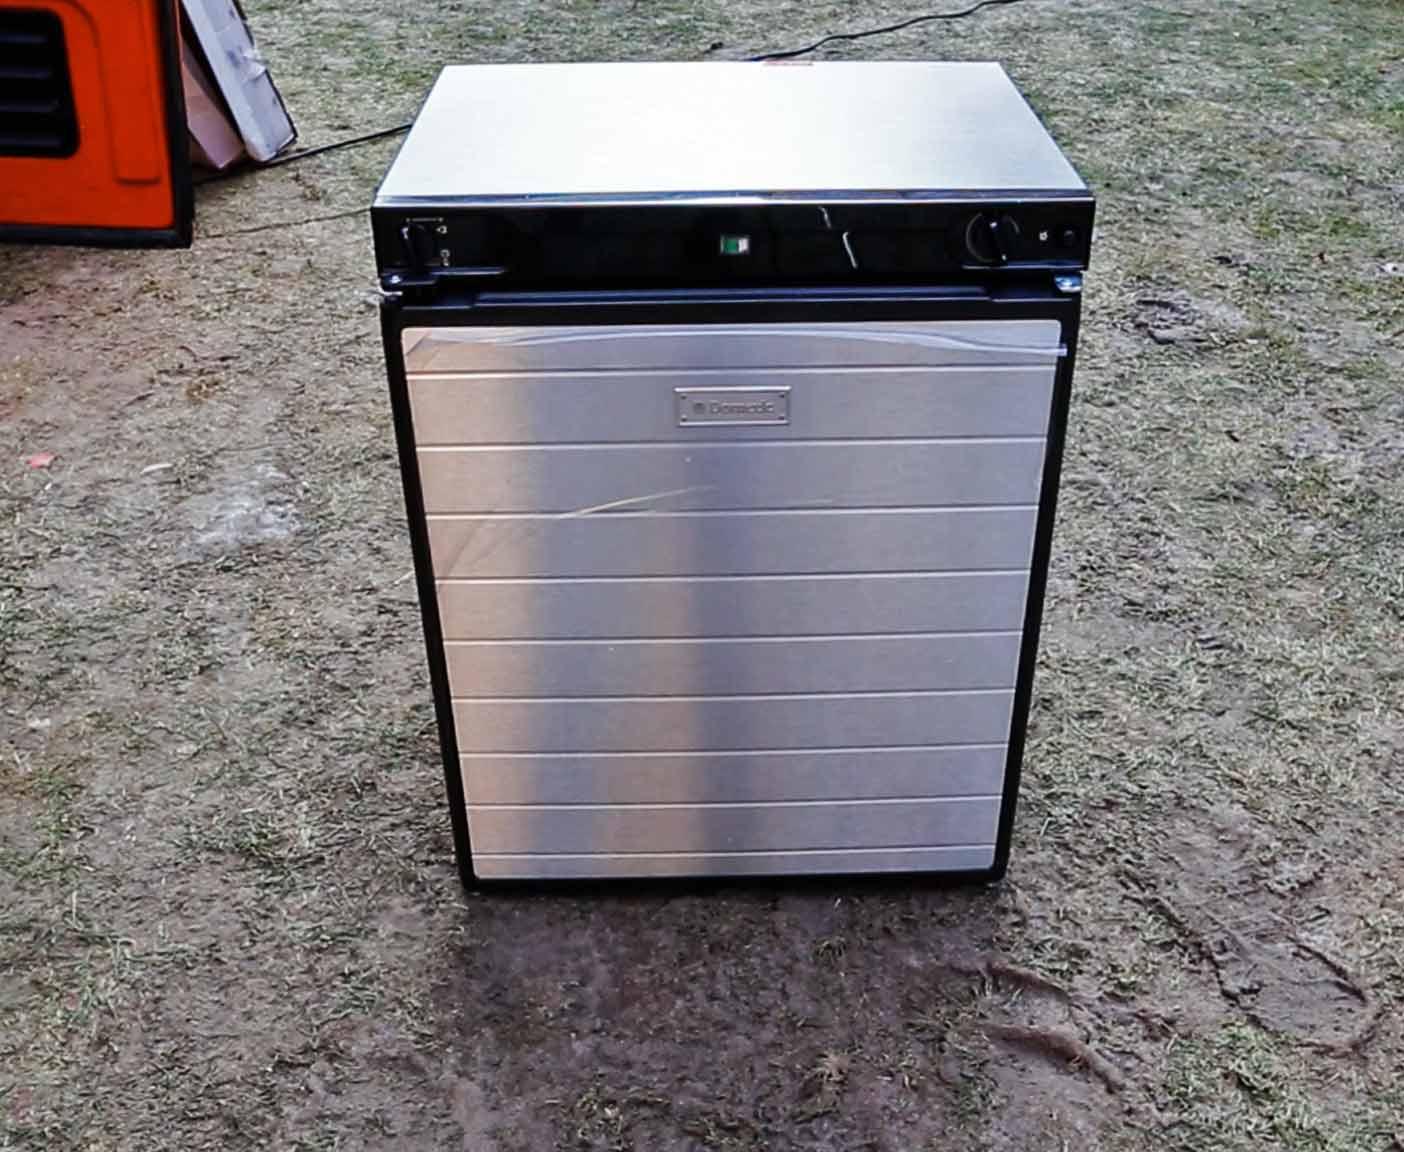 Mini Kühlschrank Dauerbetrieb : Energieeffizienzklasse a mini günstig kaufen ebay